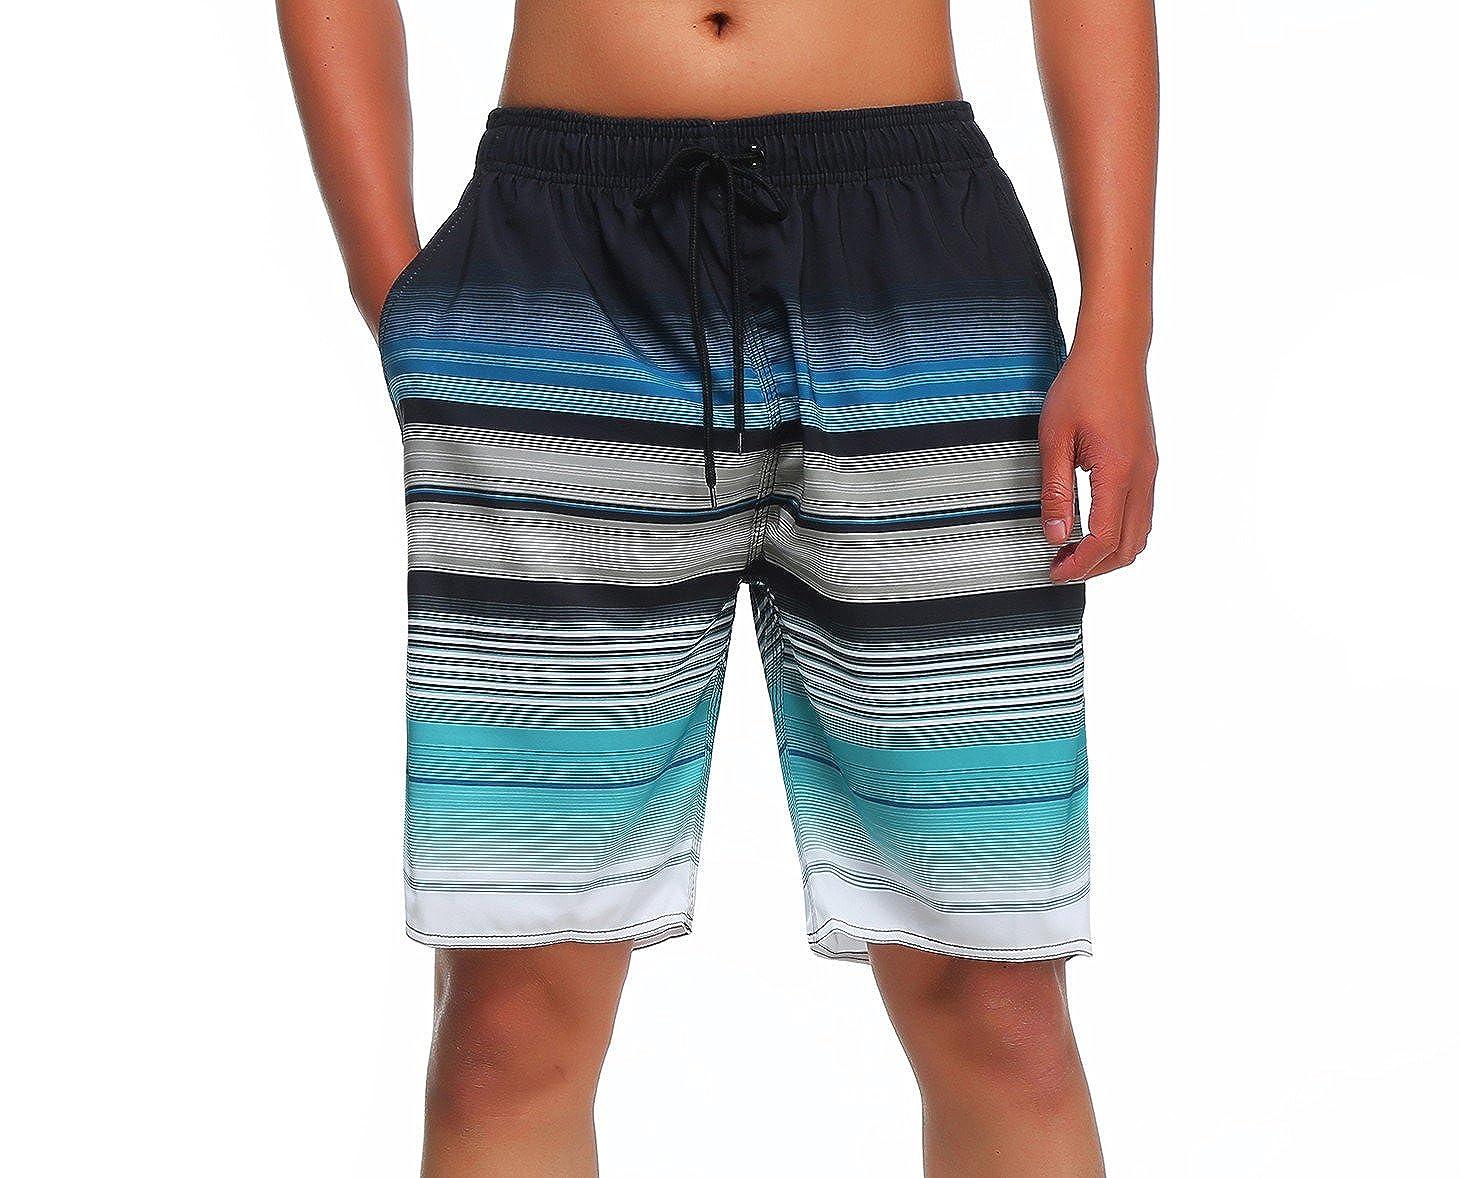 3b7dcb3b26 Amazon.com: Milankerr Men's Swim Trunks: Clothing